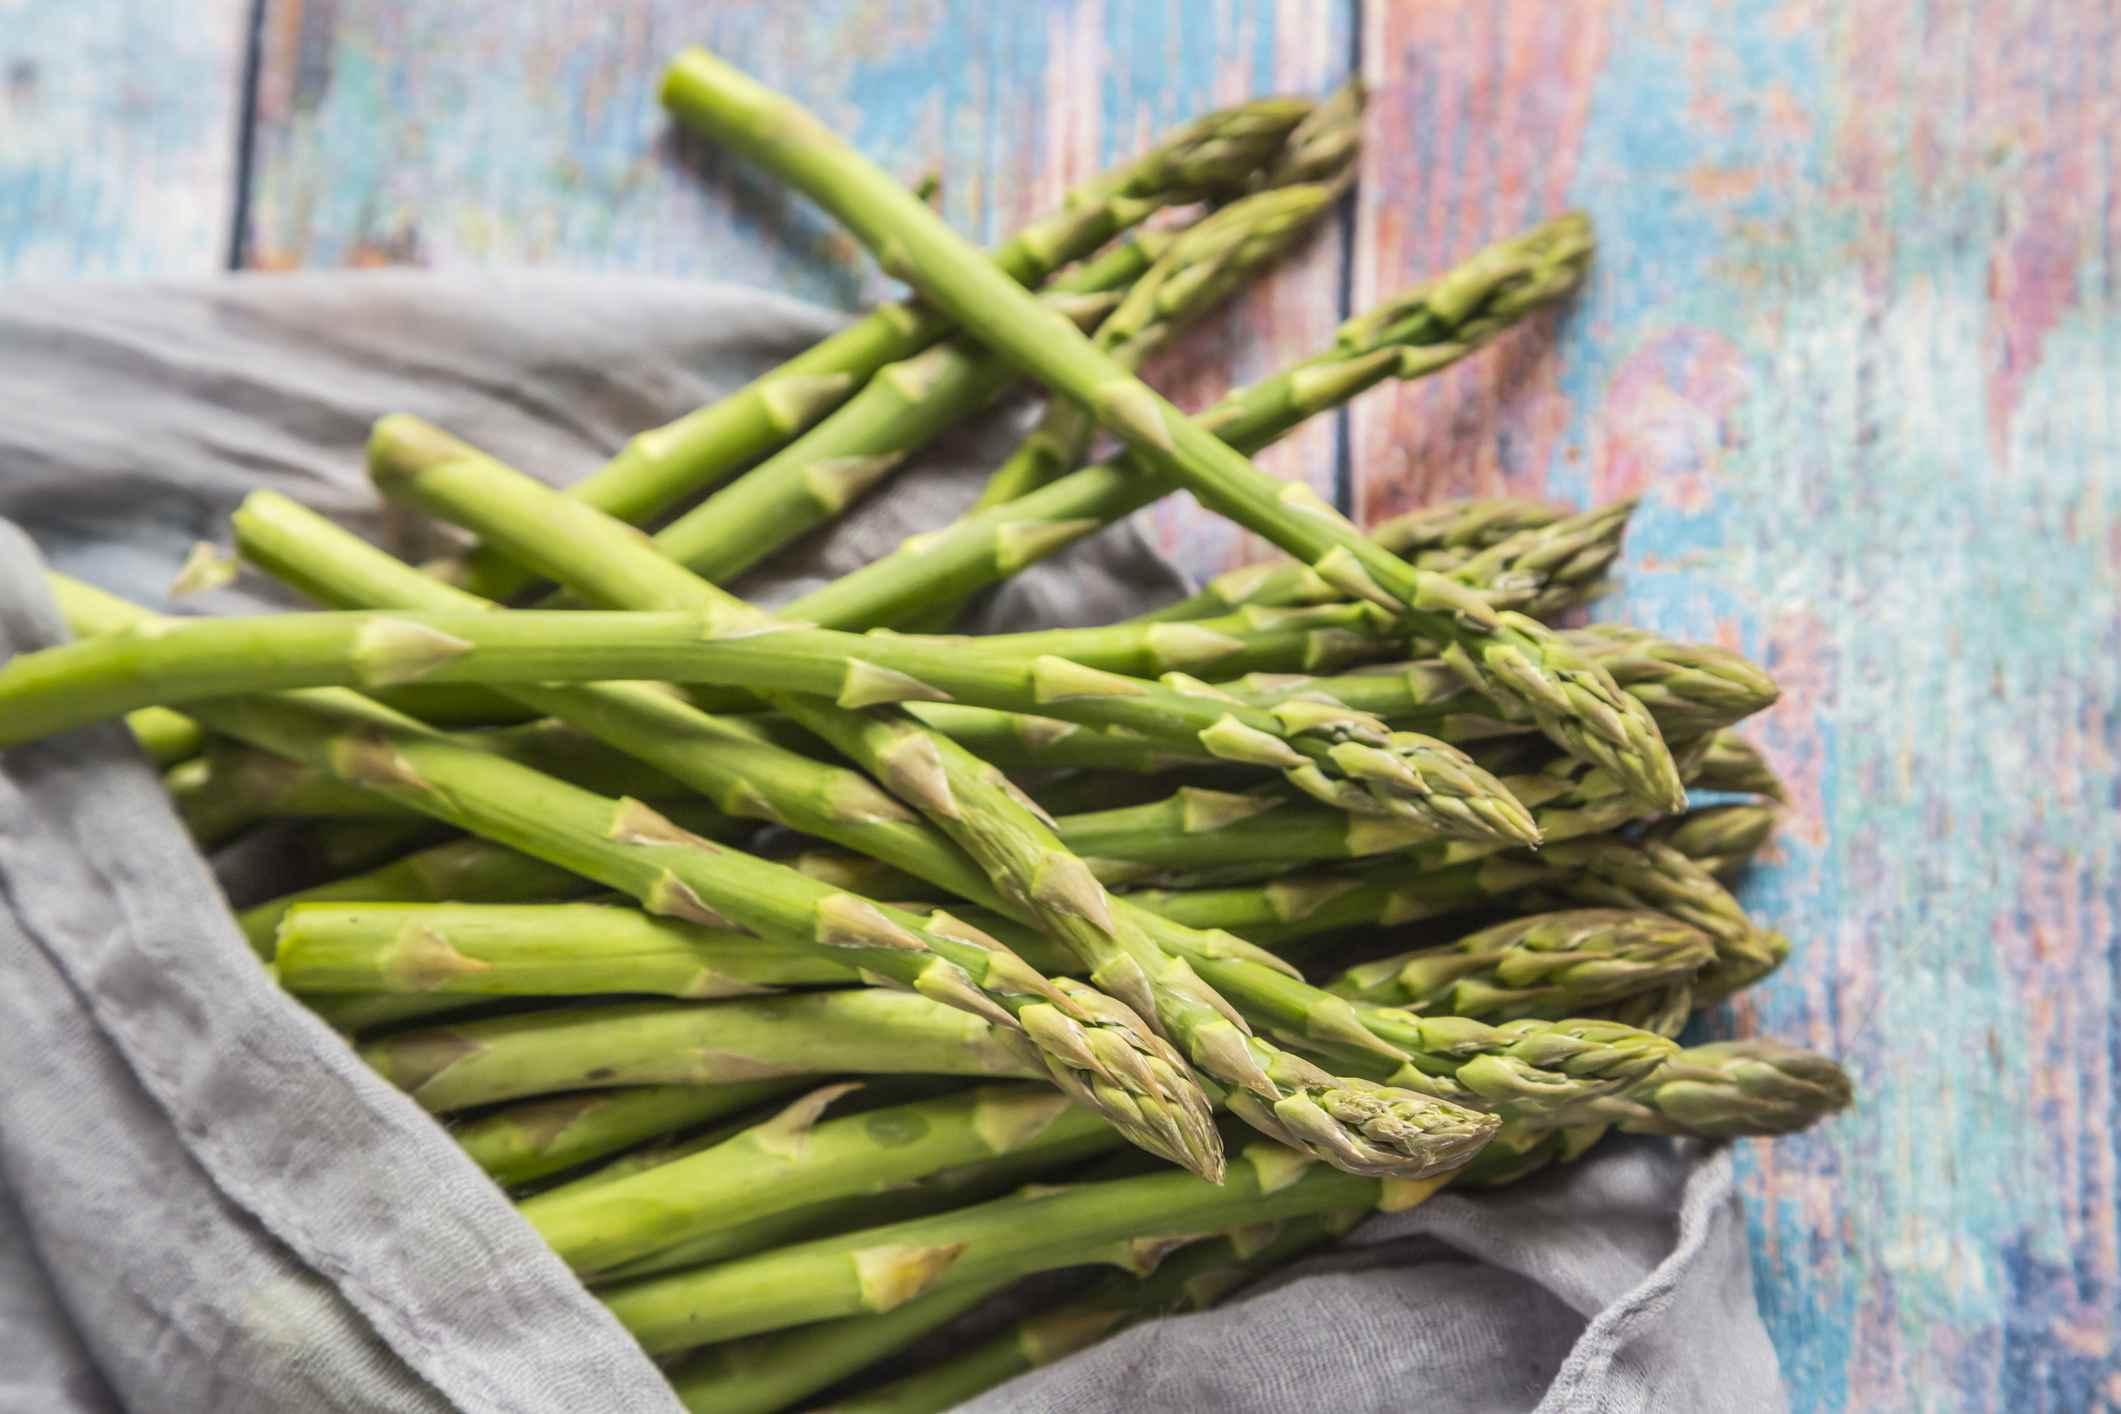 Bunch of Asparagus Spears